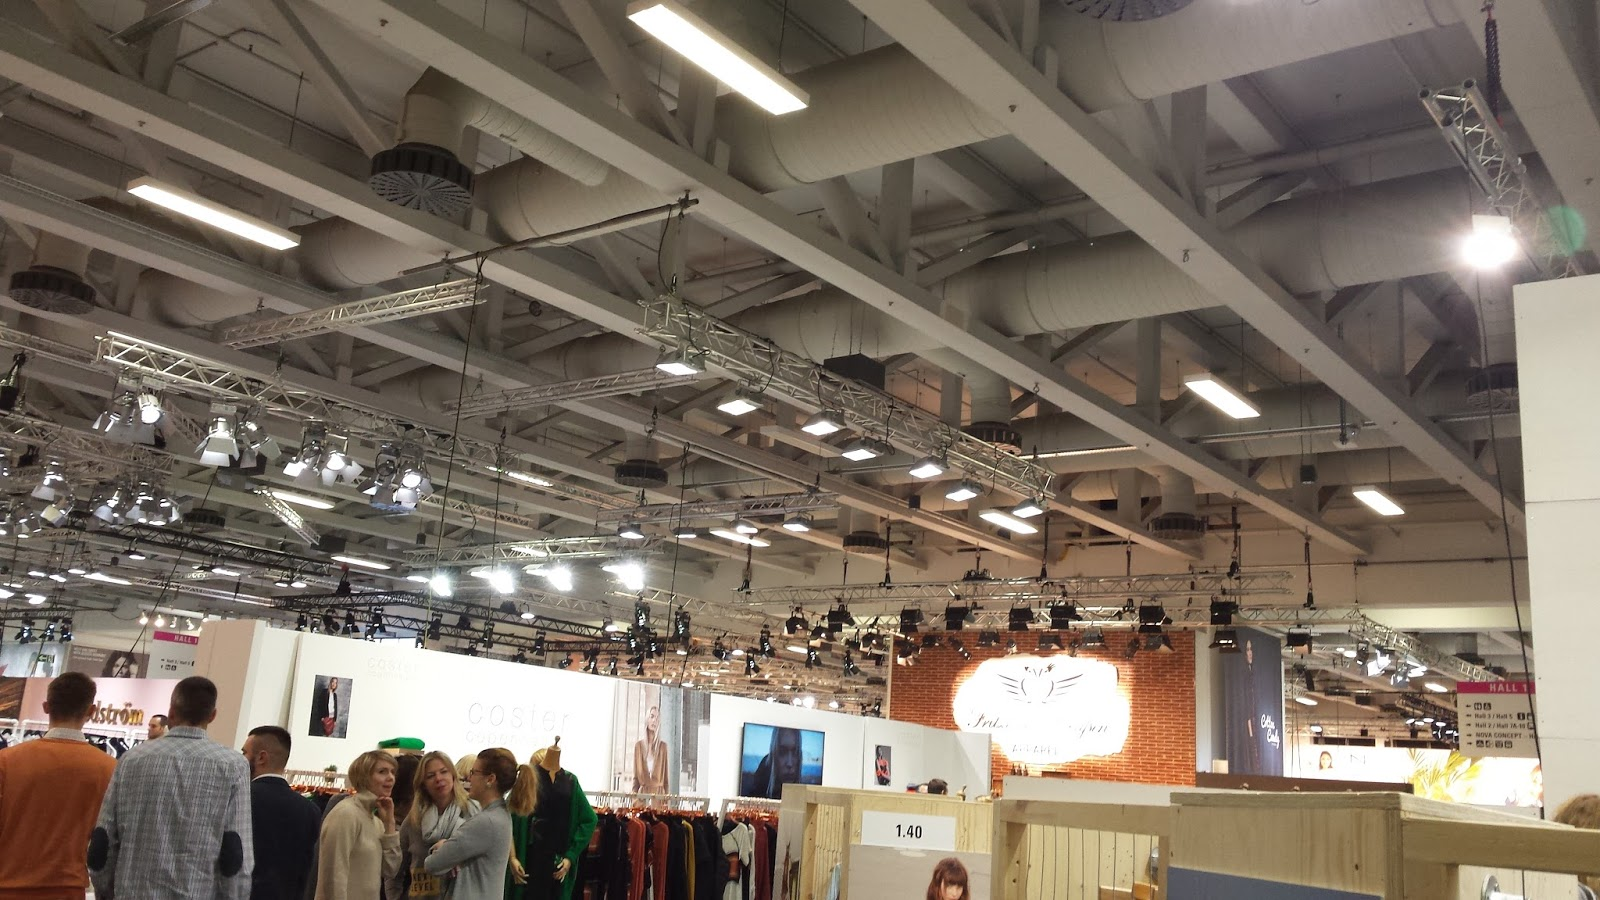 targi modowe Panorama Berlin 2017, relacja z Berlin Fashion Week, blog modowy, polska blogerka